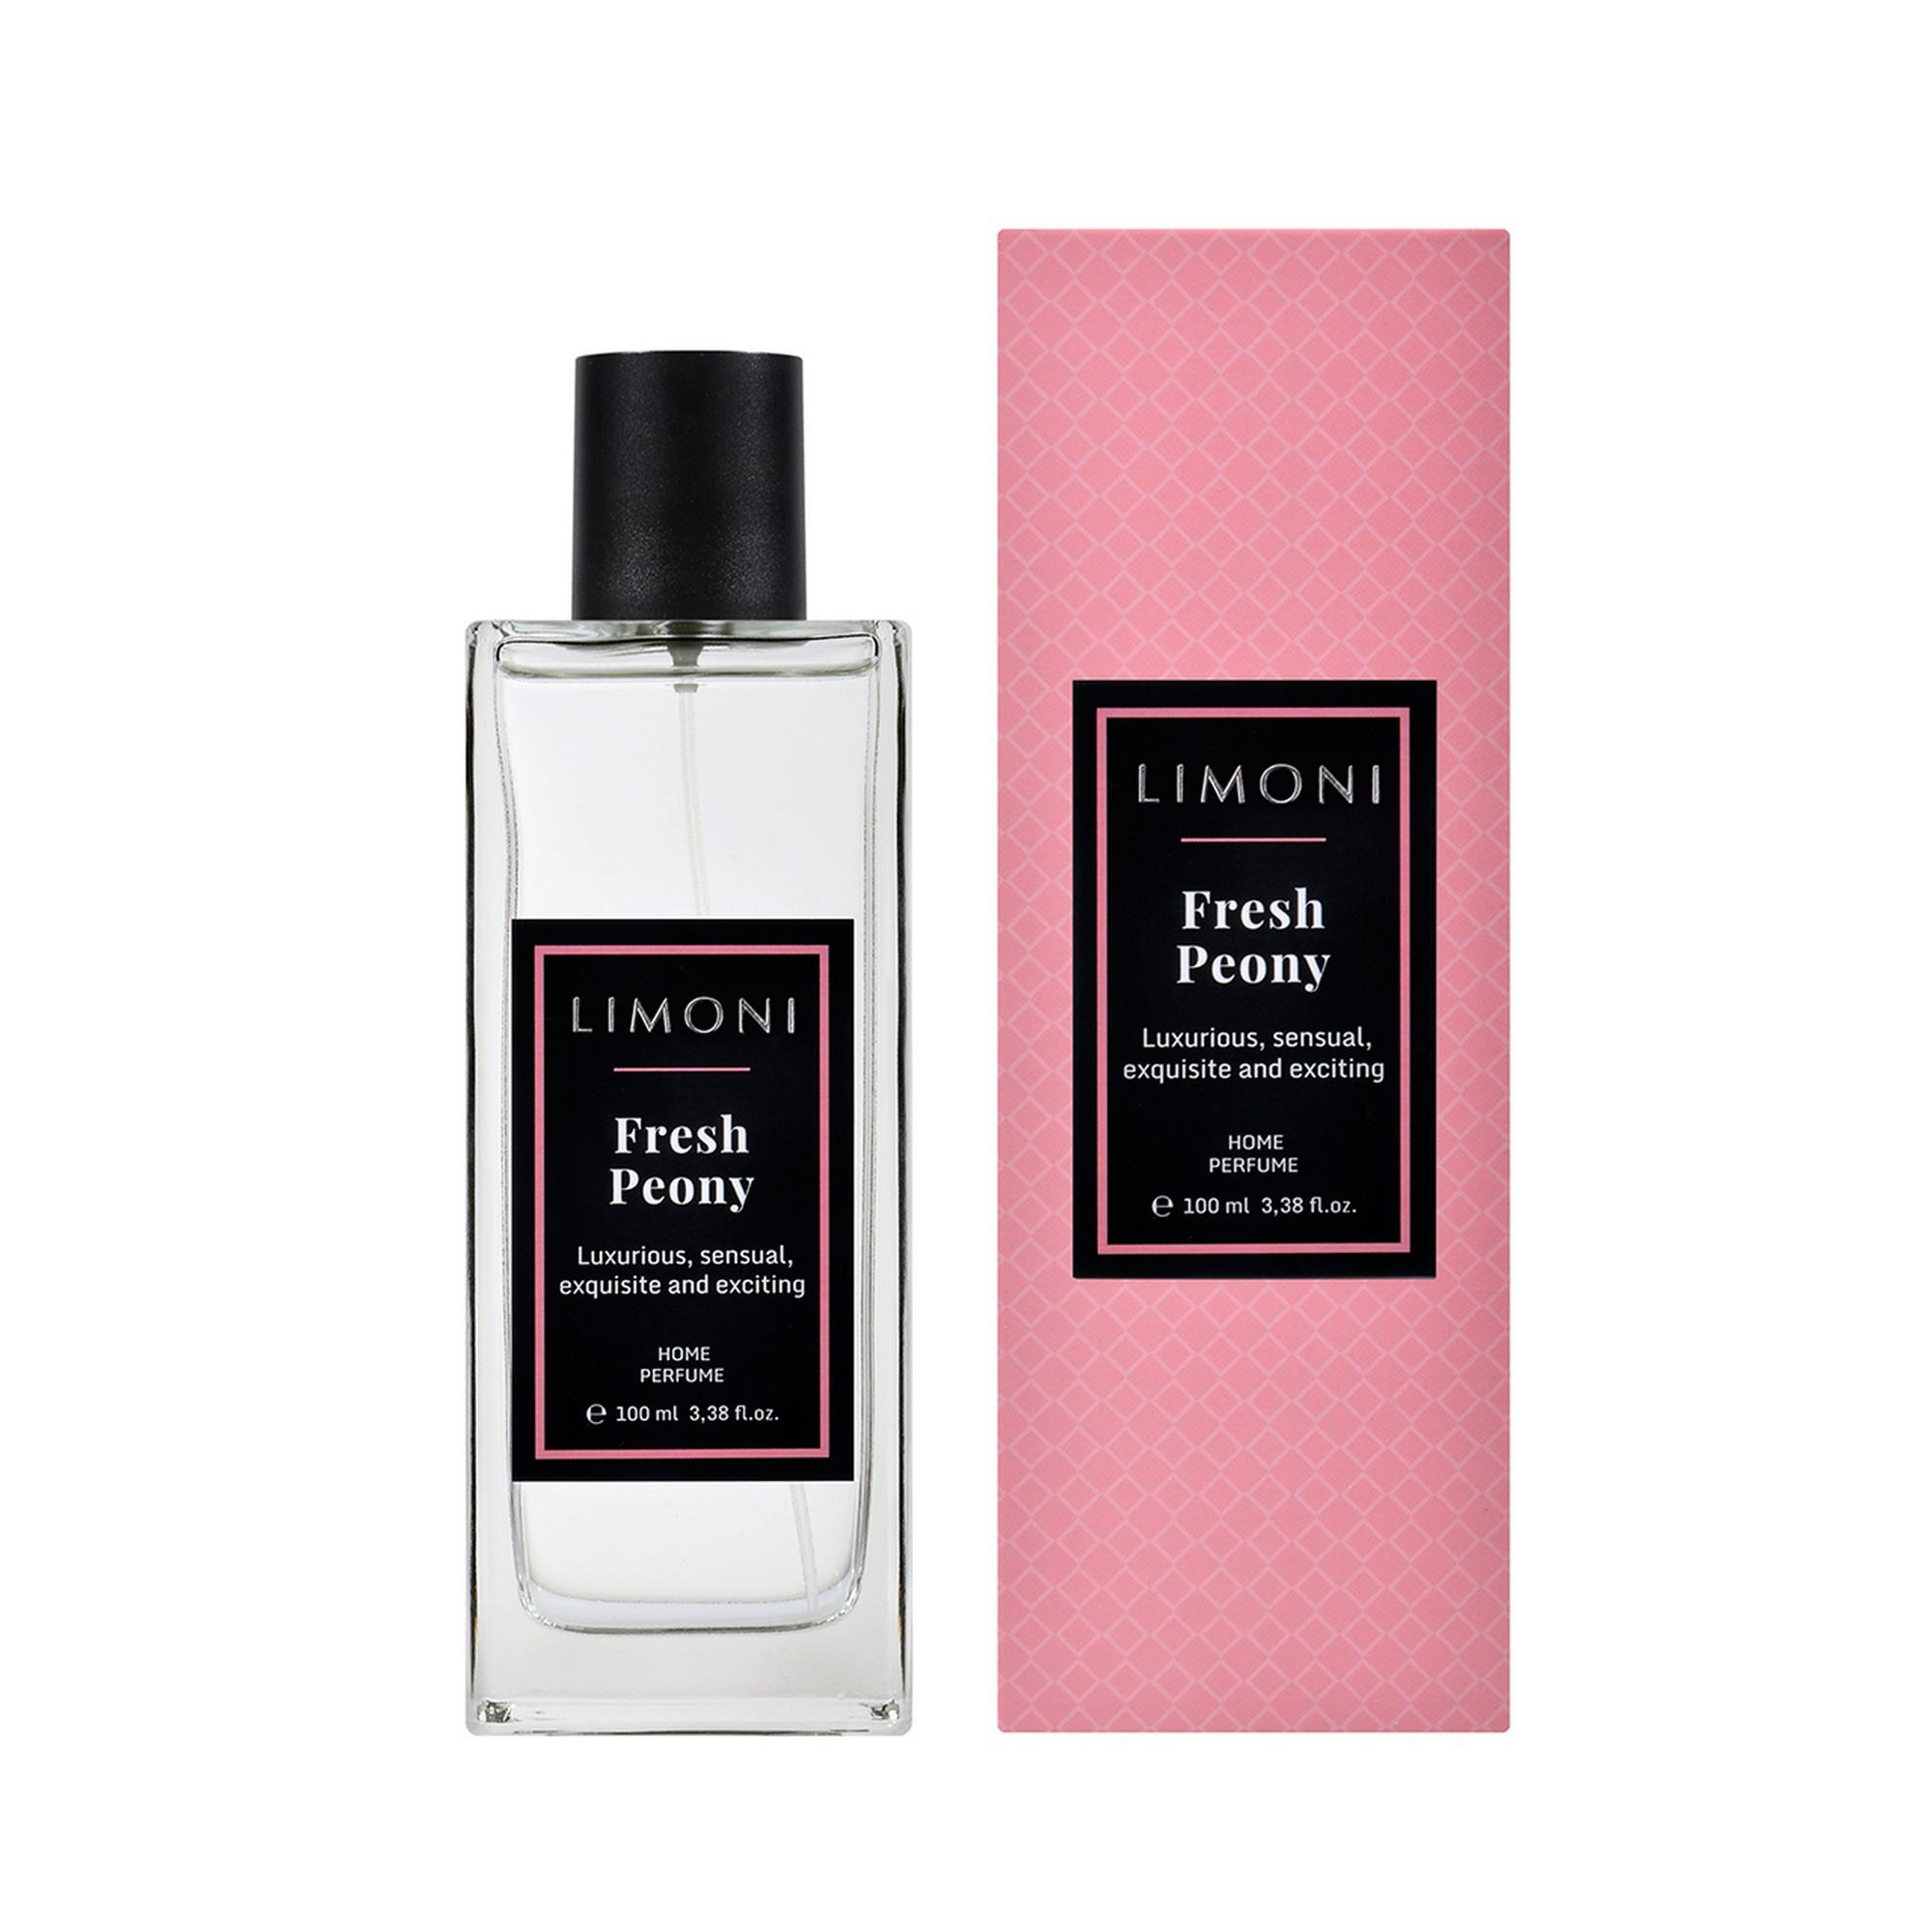 LIMONI Вода парфюмерная Свежий пион / LIMONI Fresh Peony, 100 мл от Галерея Косметики